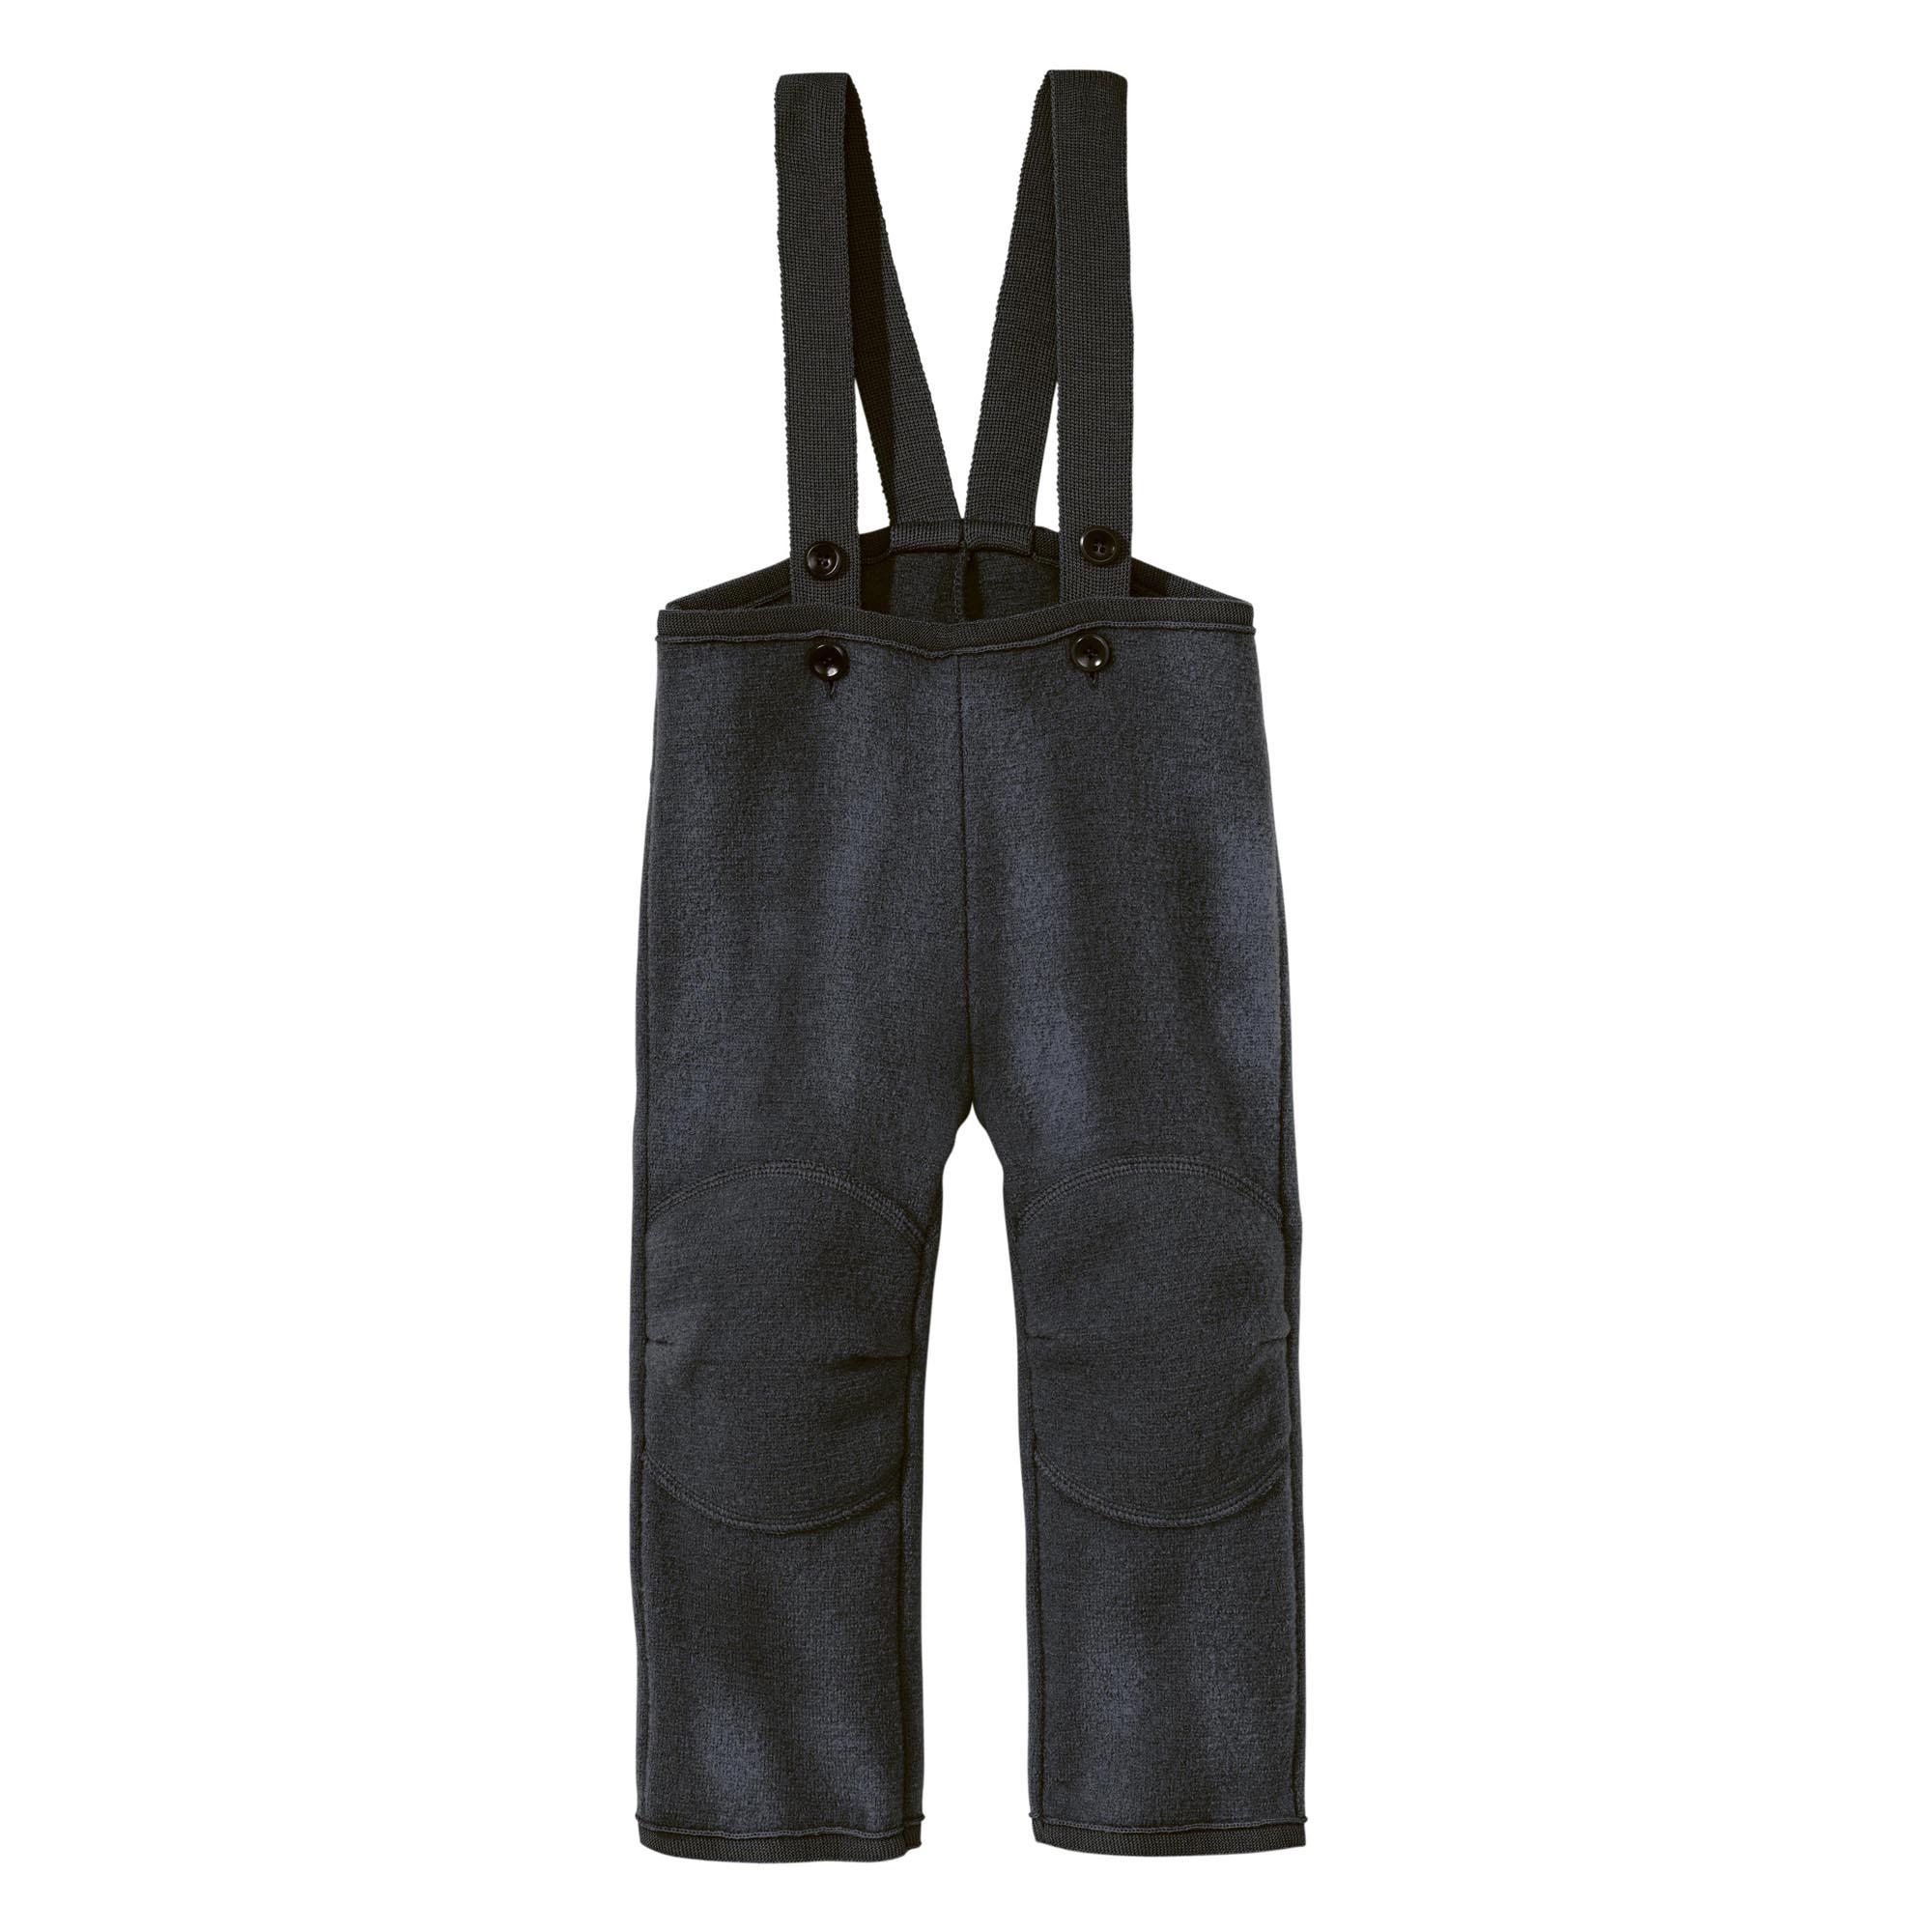 dd4c4de1b78 DISANA Flaušové kalhoty s laclem merino vlna antracit